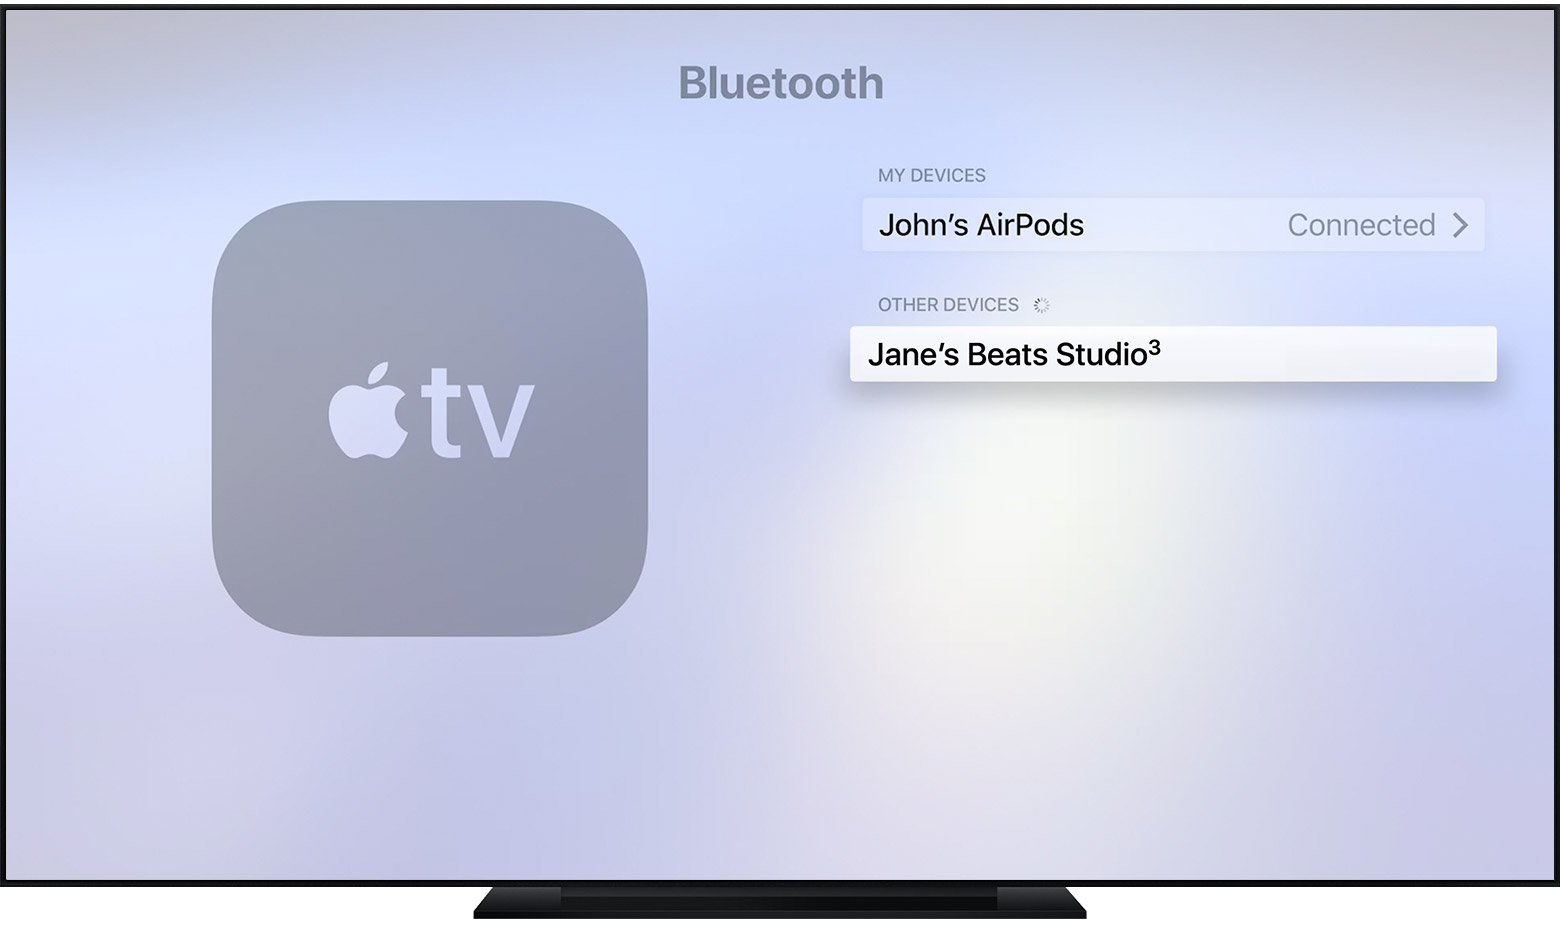 tvos12-settings-remotes-devices-bluetooth.jpg